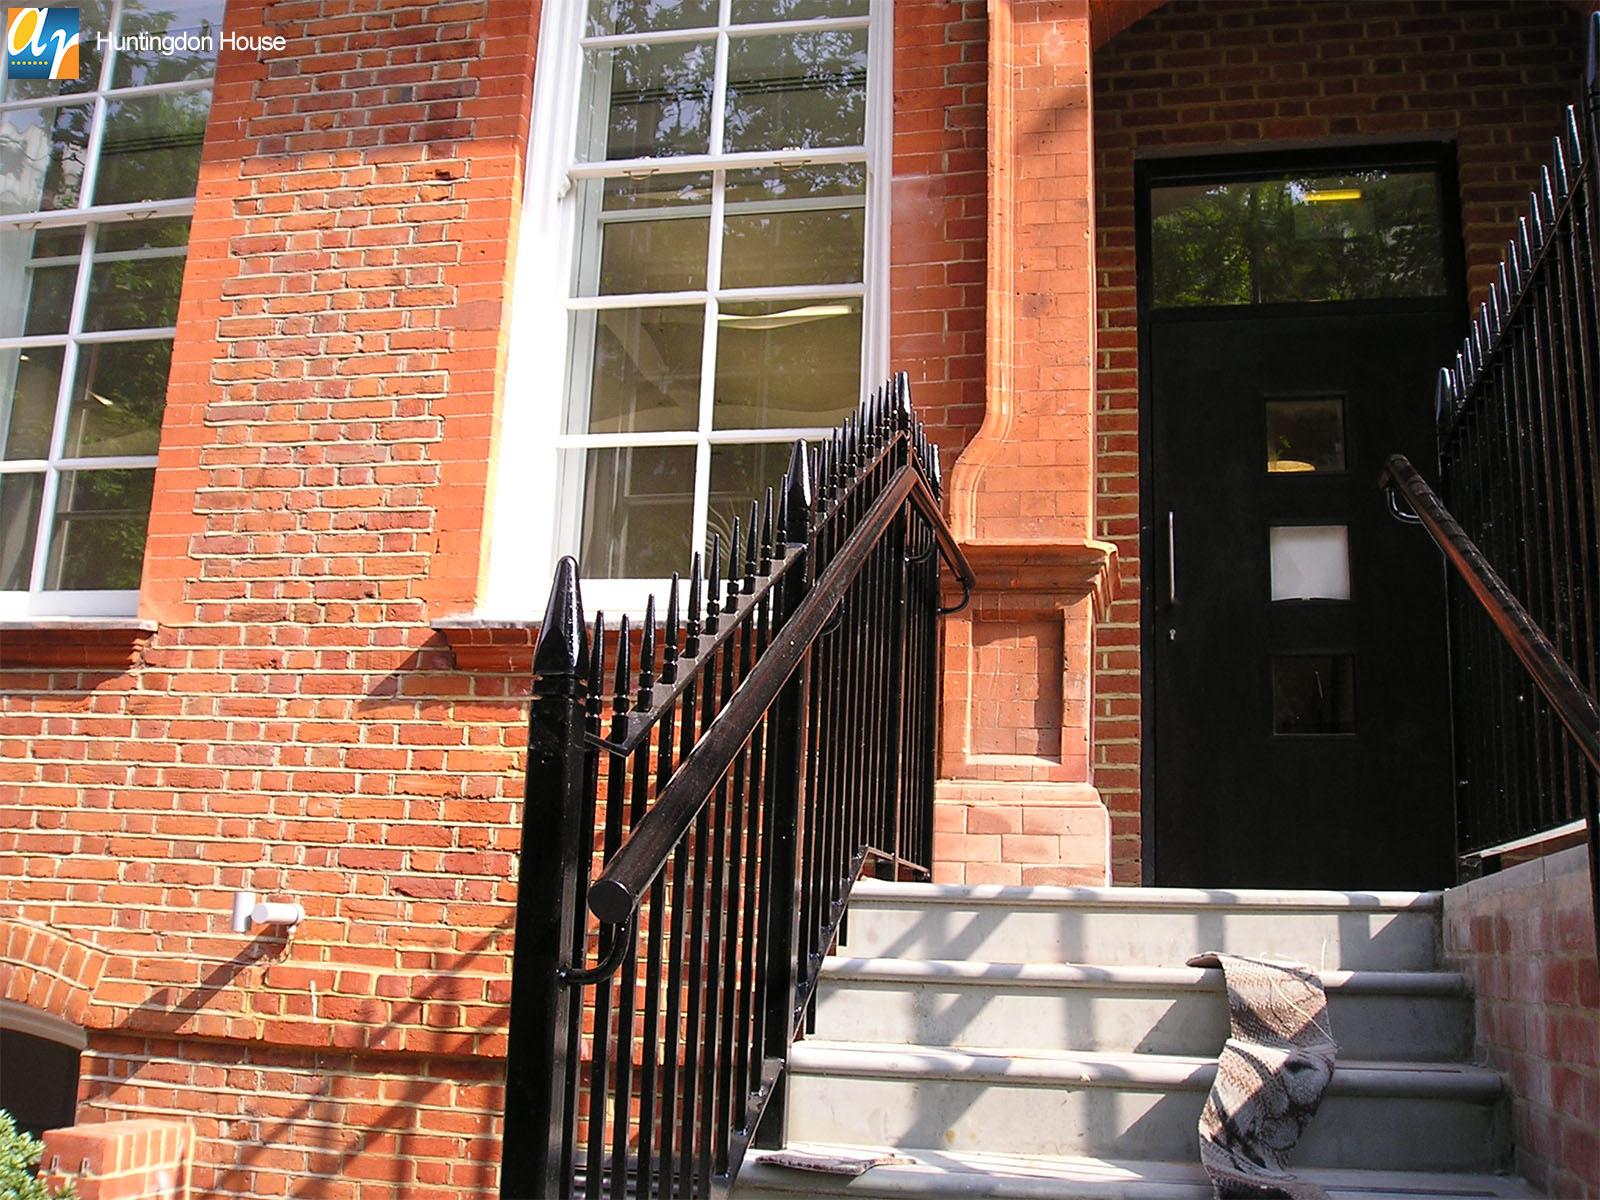 Huntingdon House